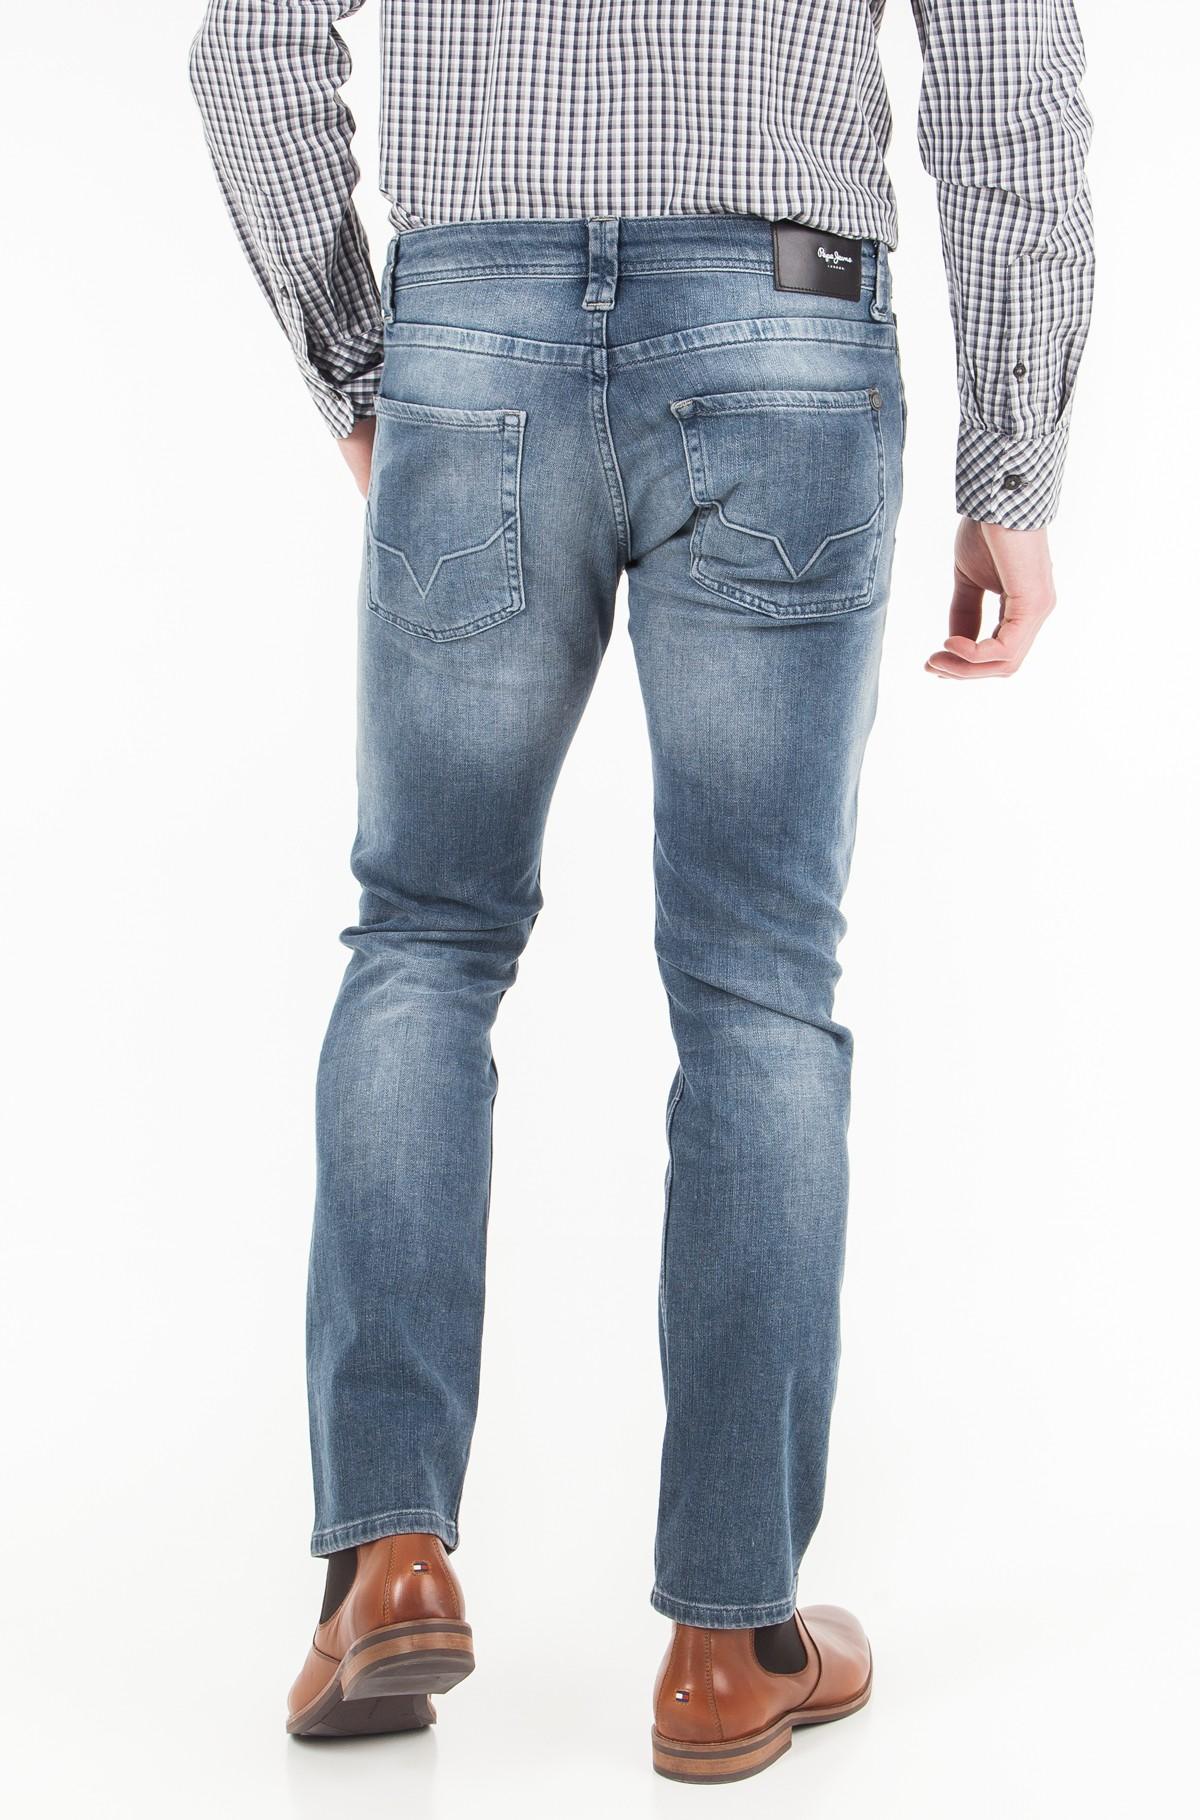 Jeans Cash/PM200124GD7-full-2